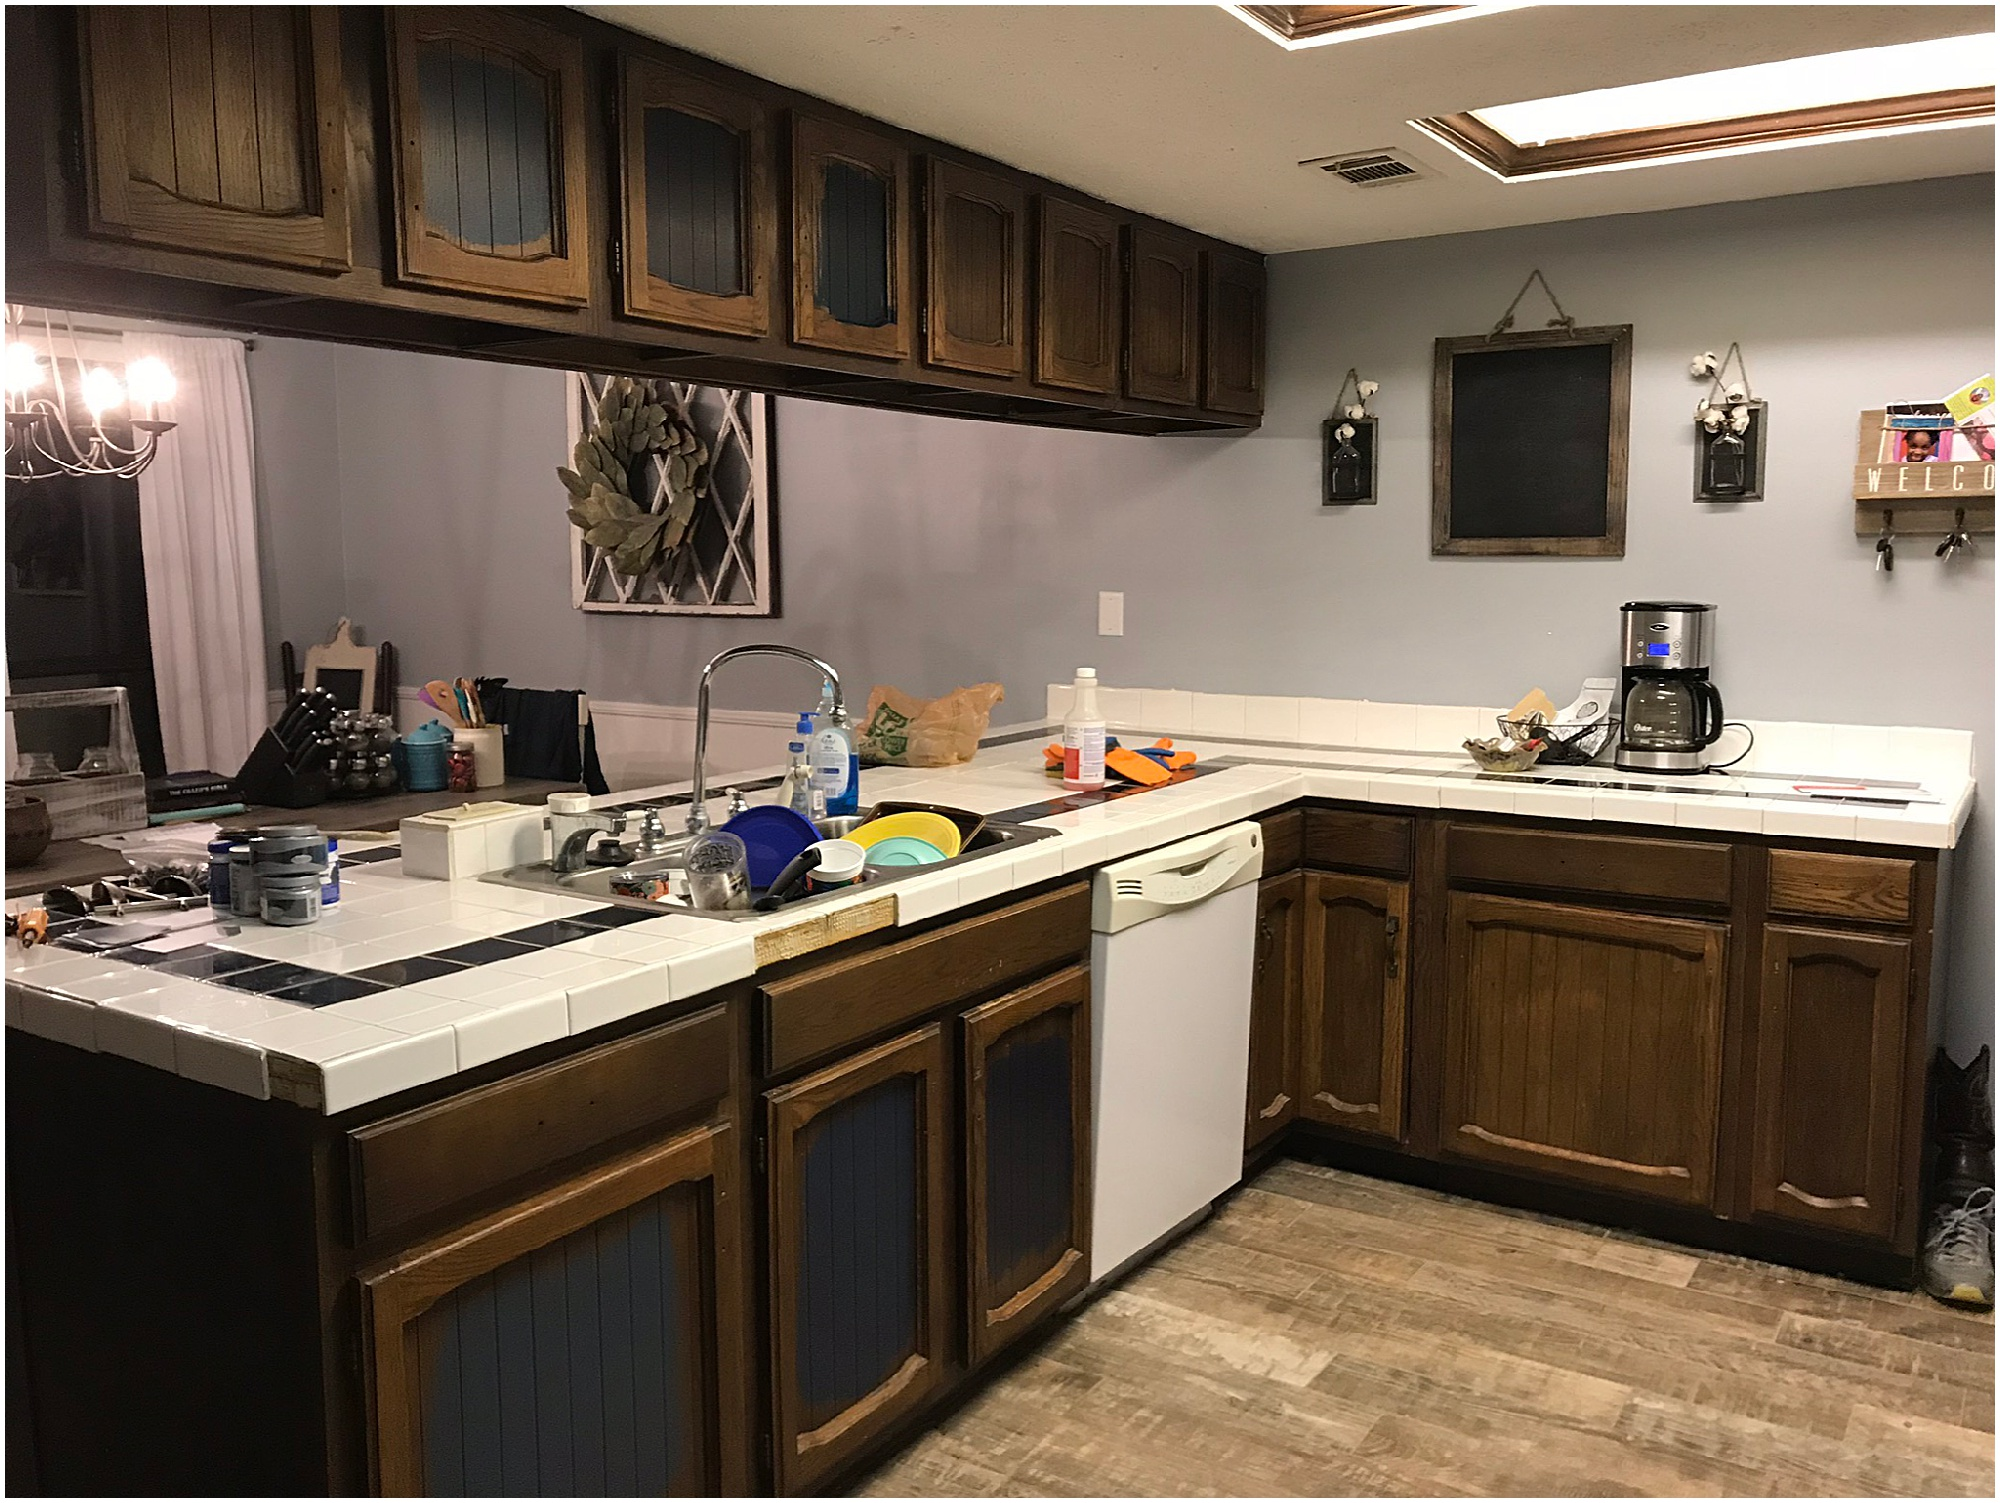 hambick-house-kitchen-renovation-fixer-upper_0004.jpg